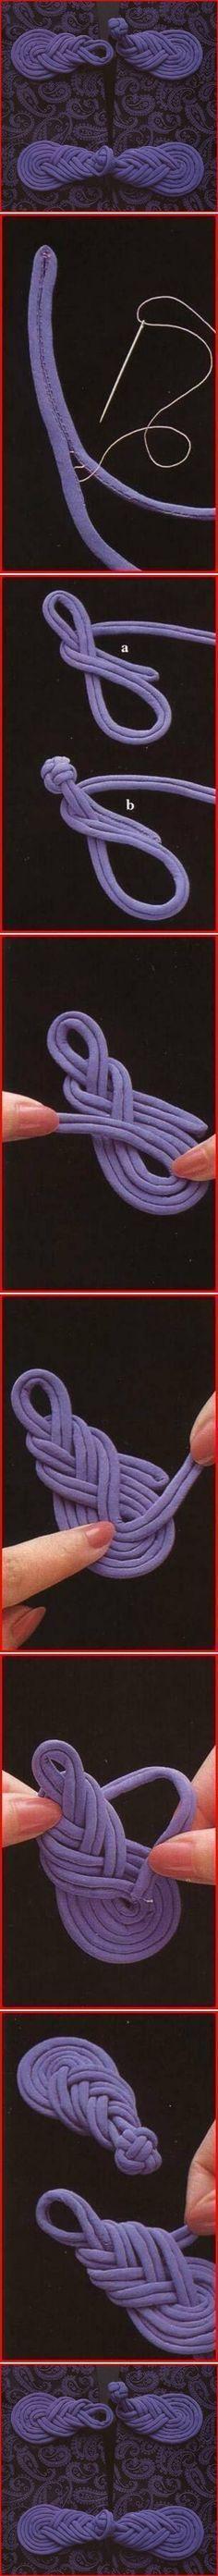 Arte & Reciclaje: Nudo chino usado como botón.